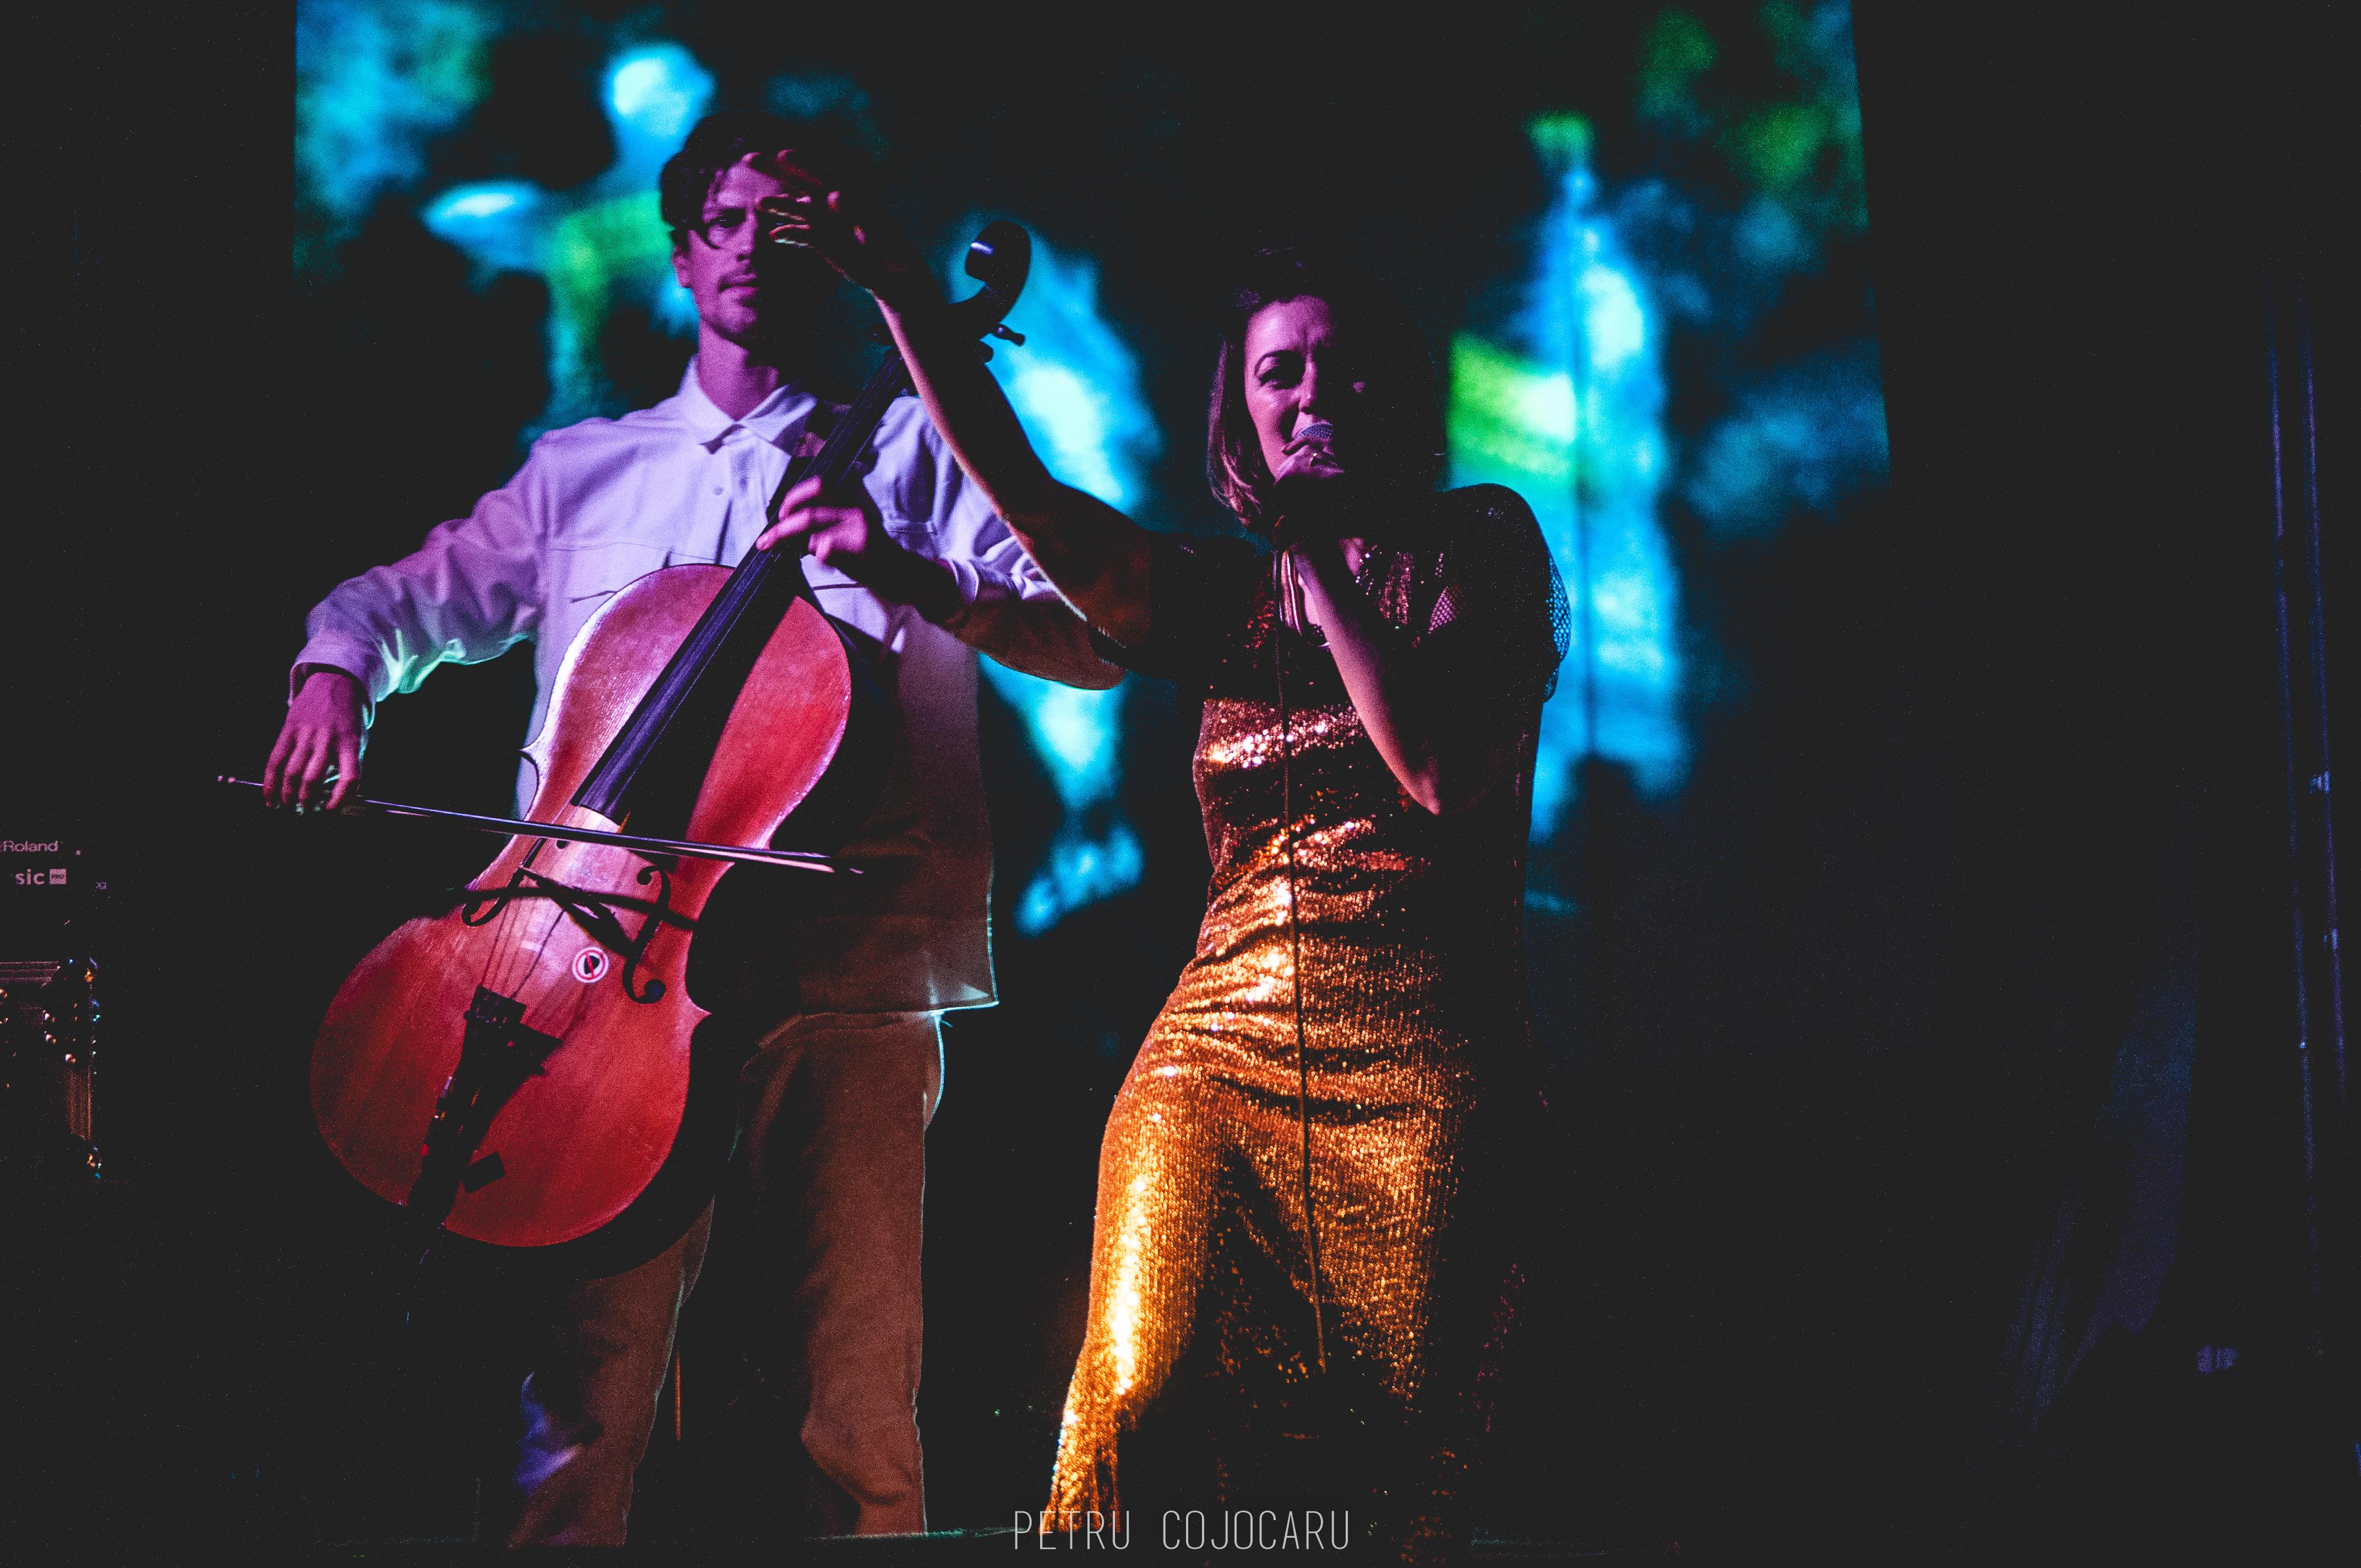 Shine @Petru Dojocaru